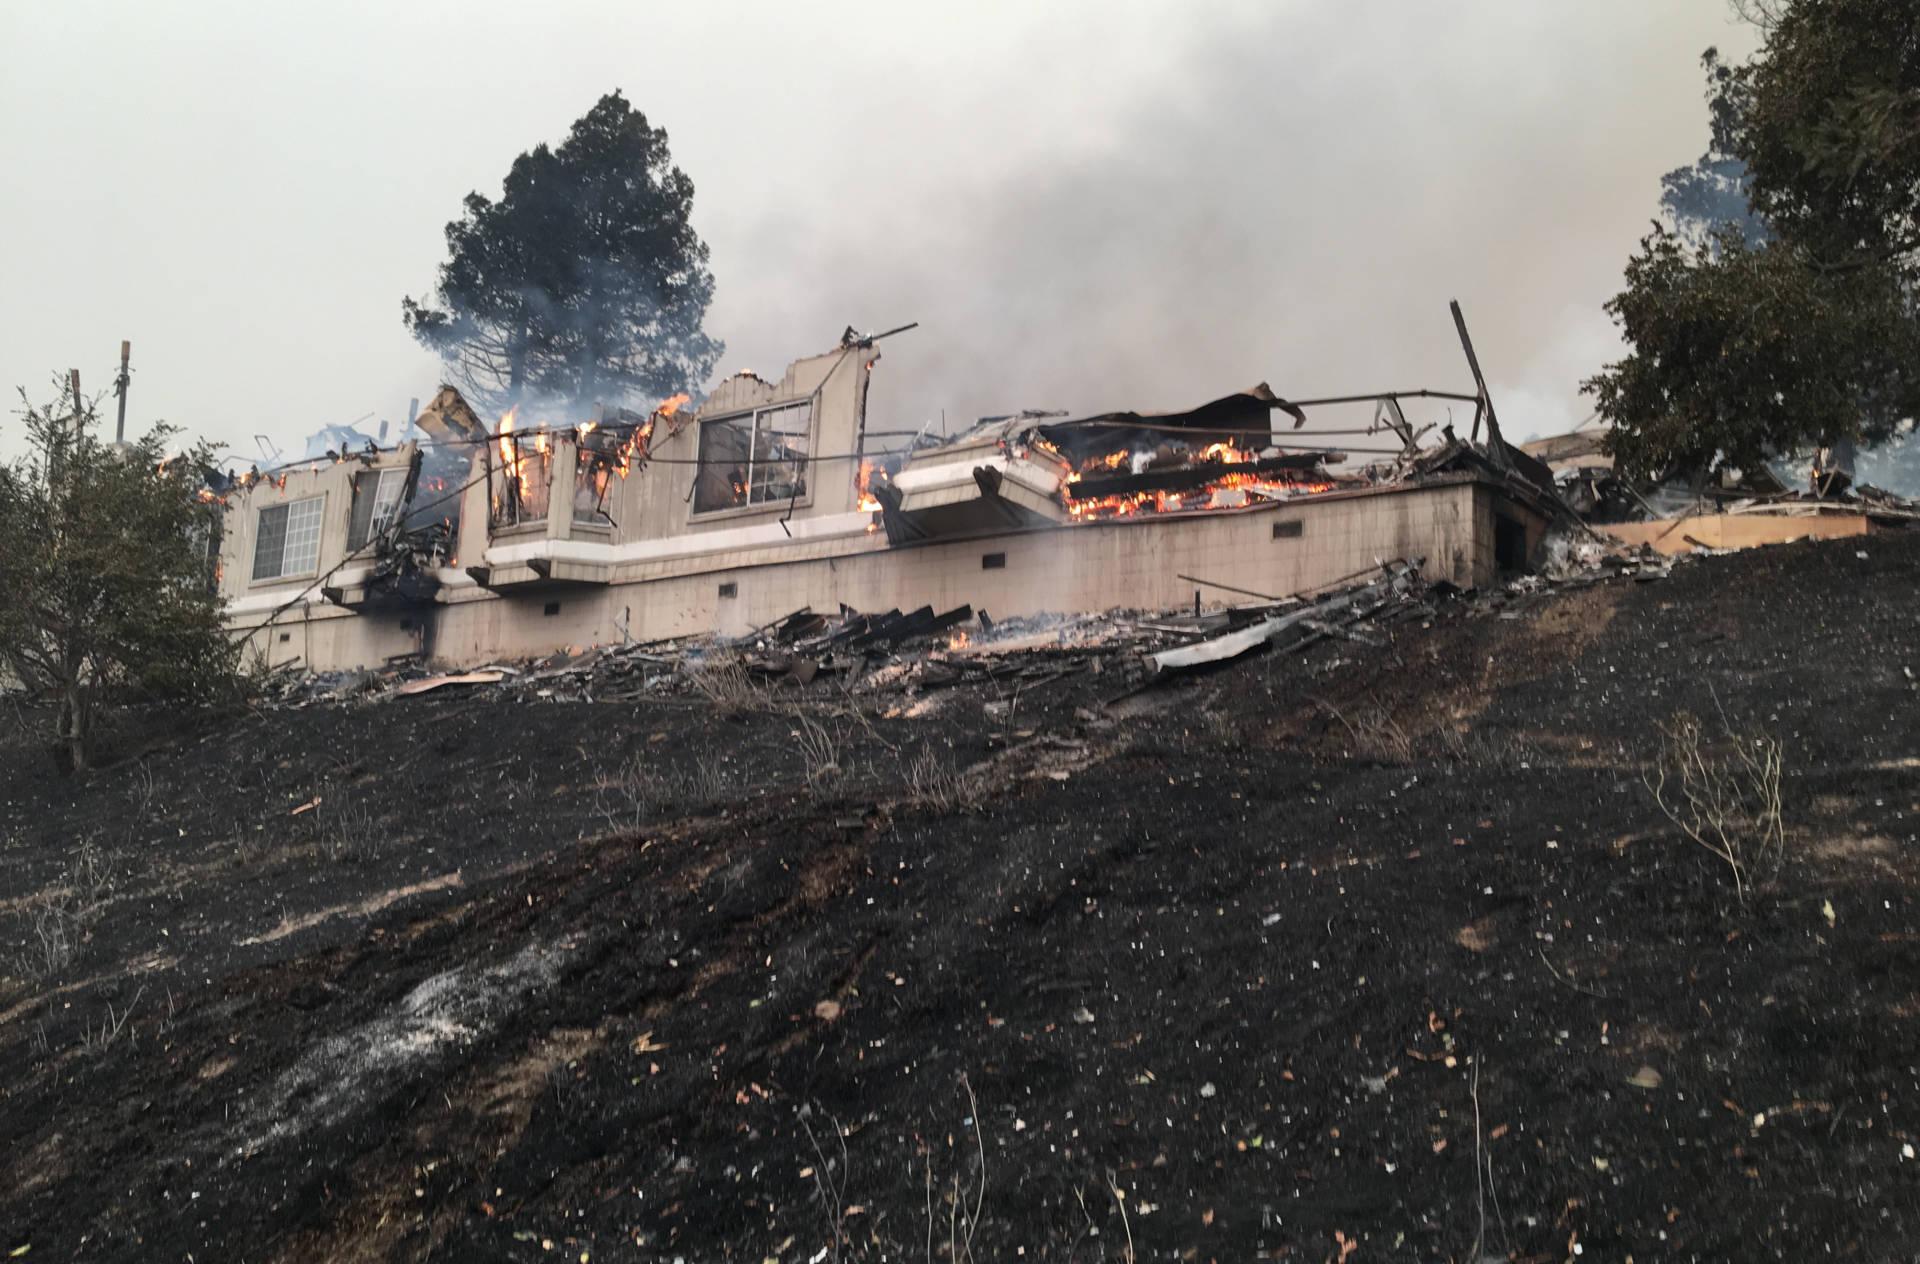 Fountaingrove neighborhood in Santa Rosa near the Hilton Hotel, which burned down. Lesley McClurg/KQED